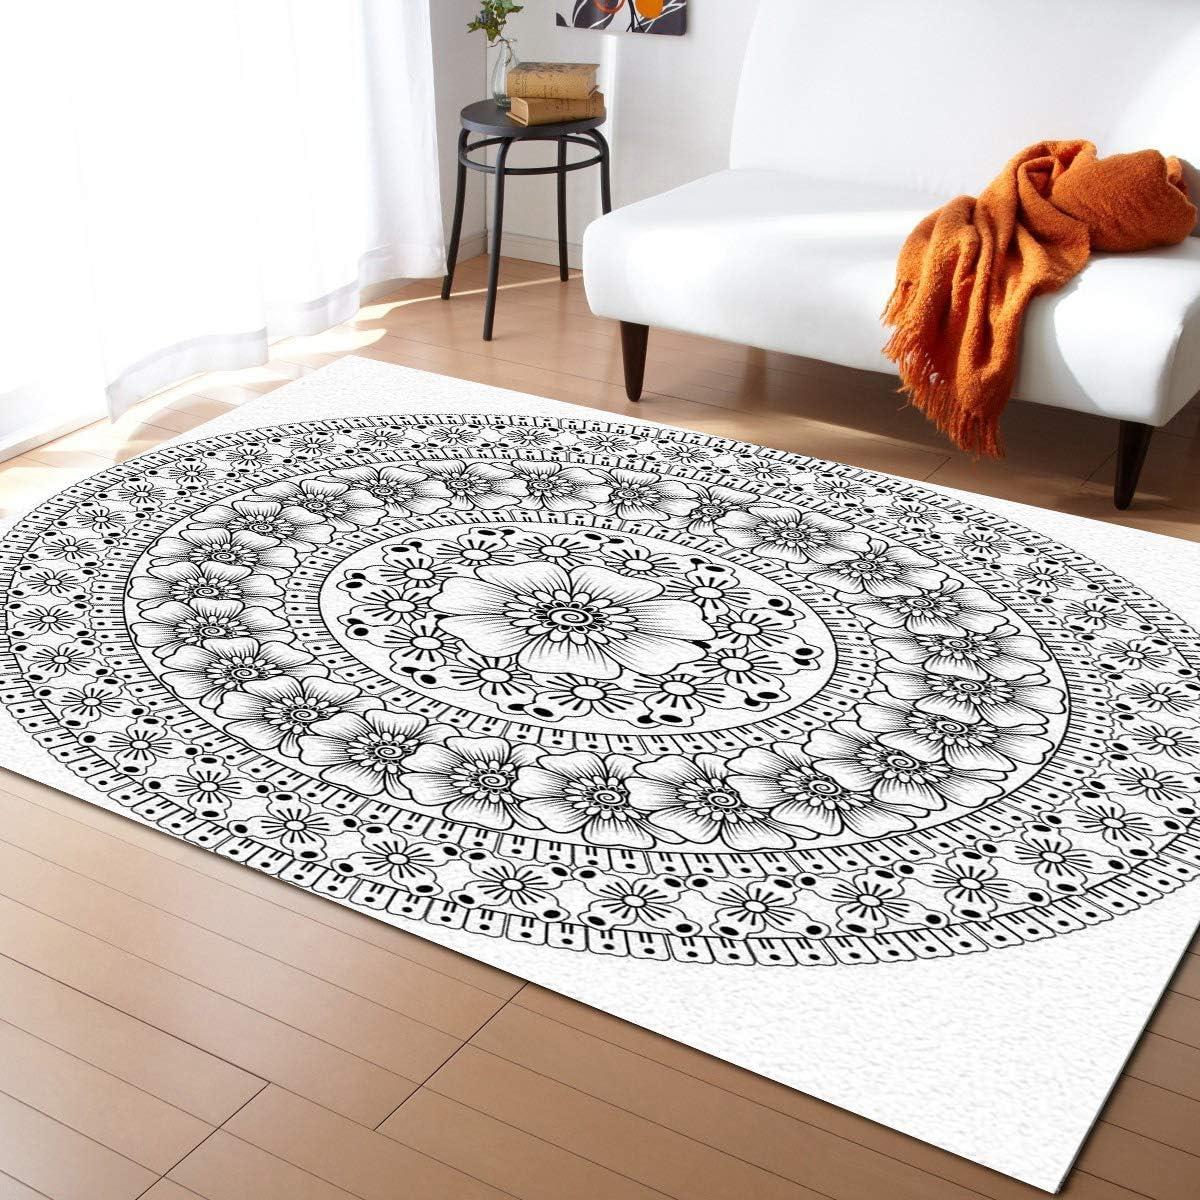 Olivefox Product 4x6 Feet Floor Mat Rug In stock Pattern Area Runn Mandala